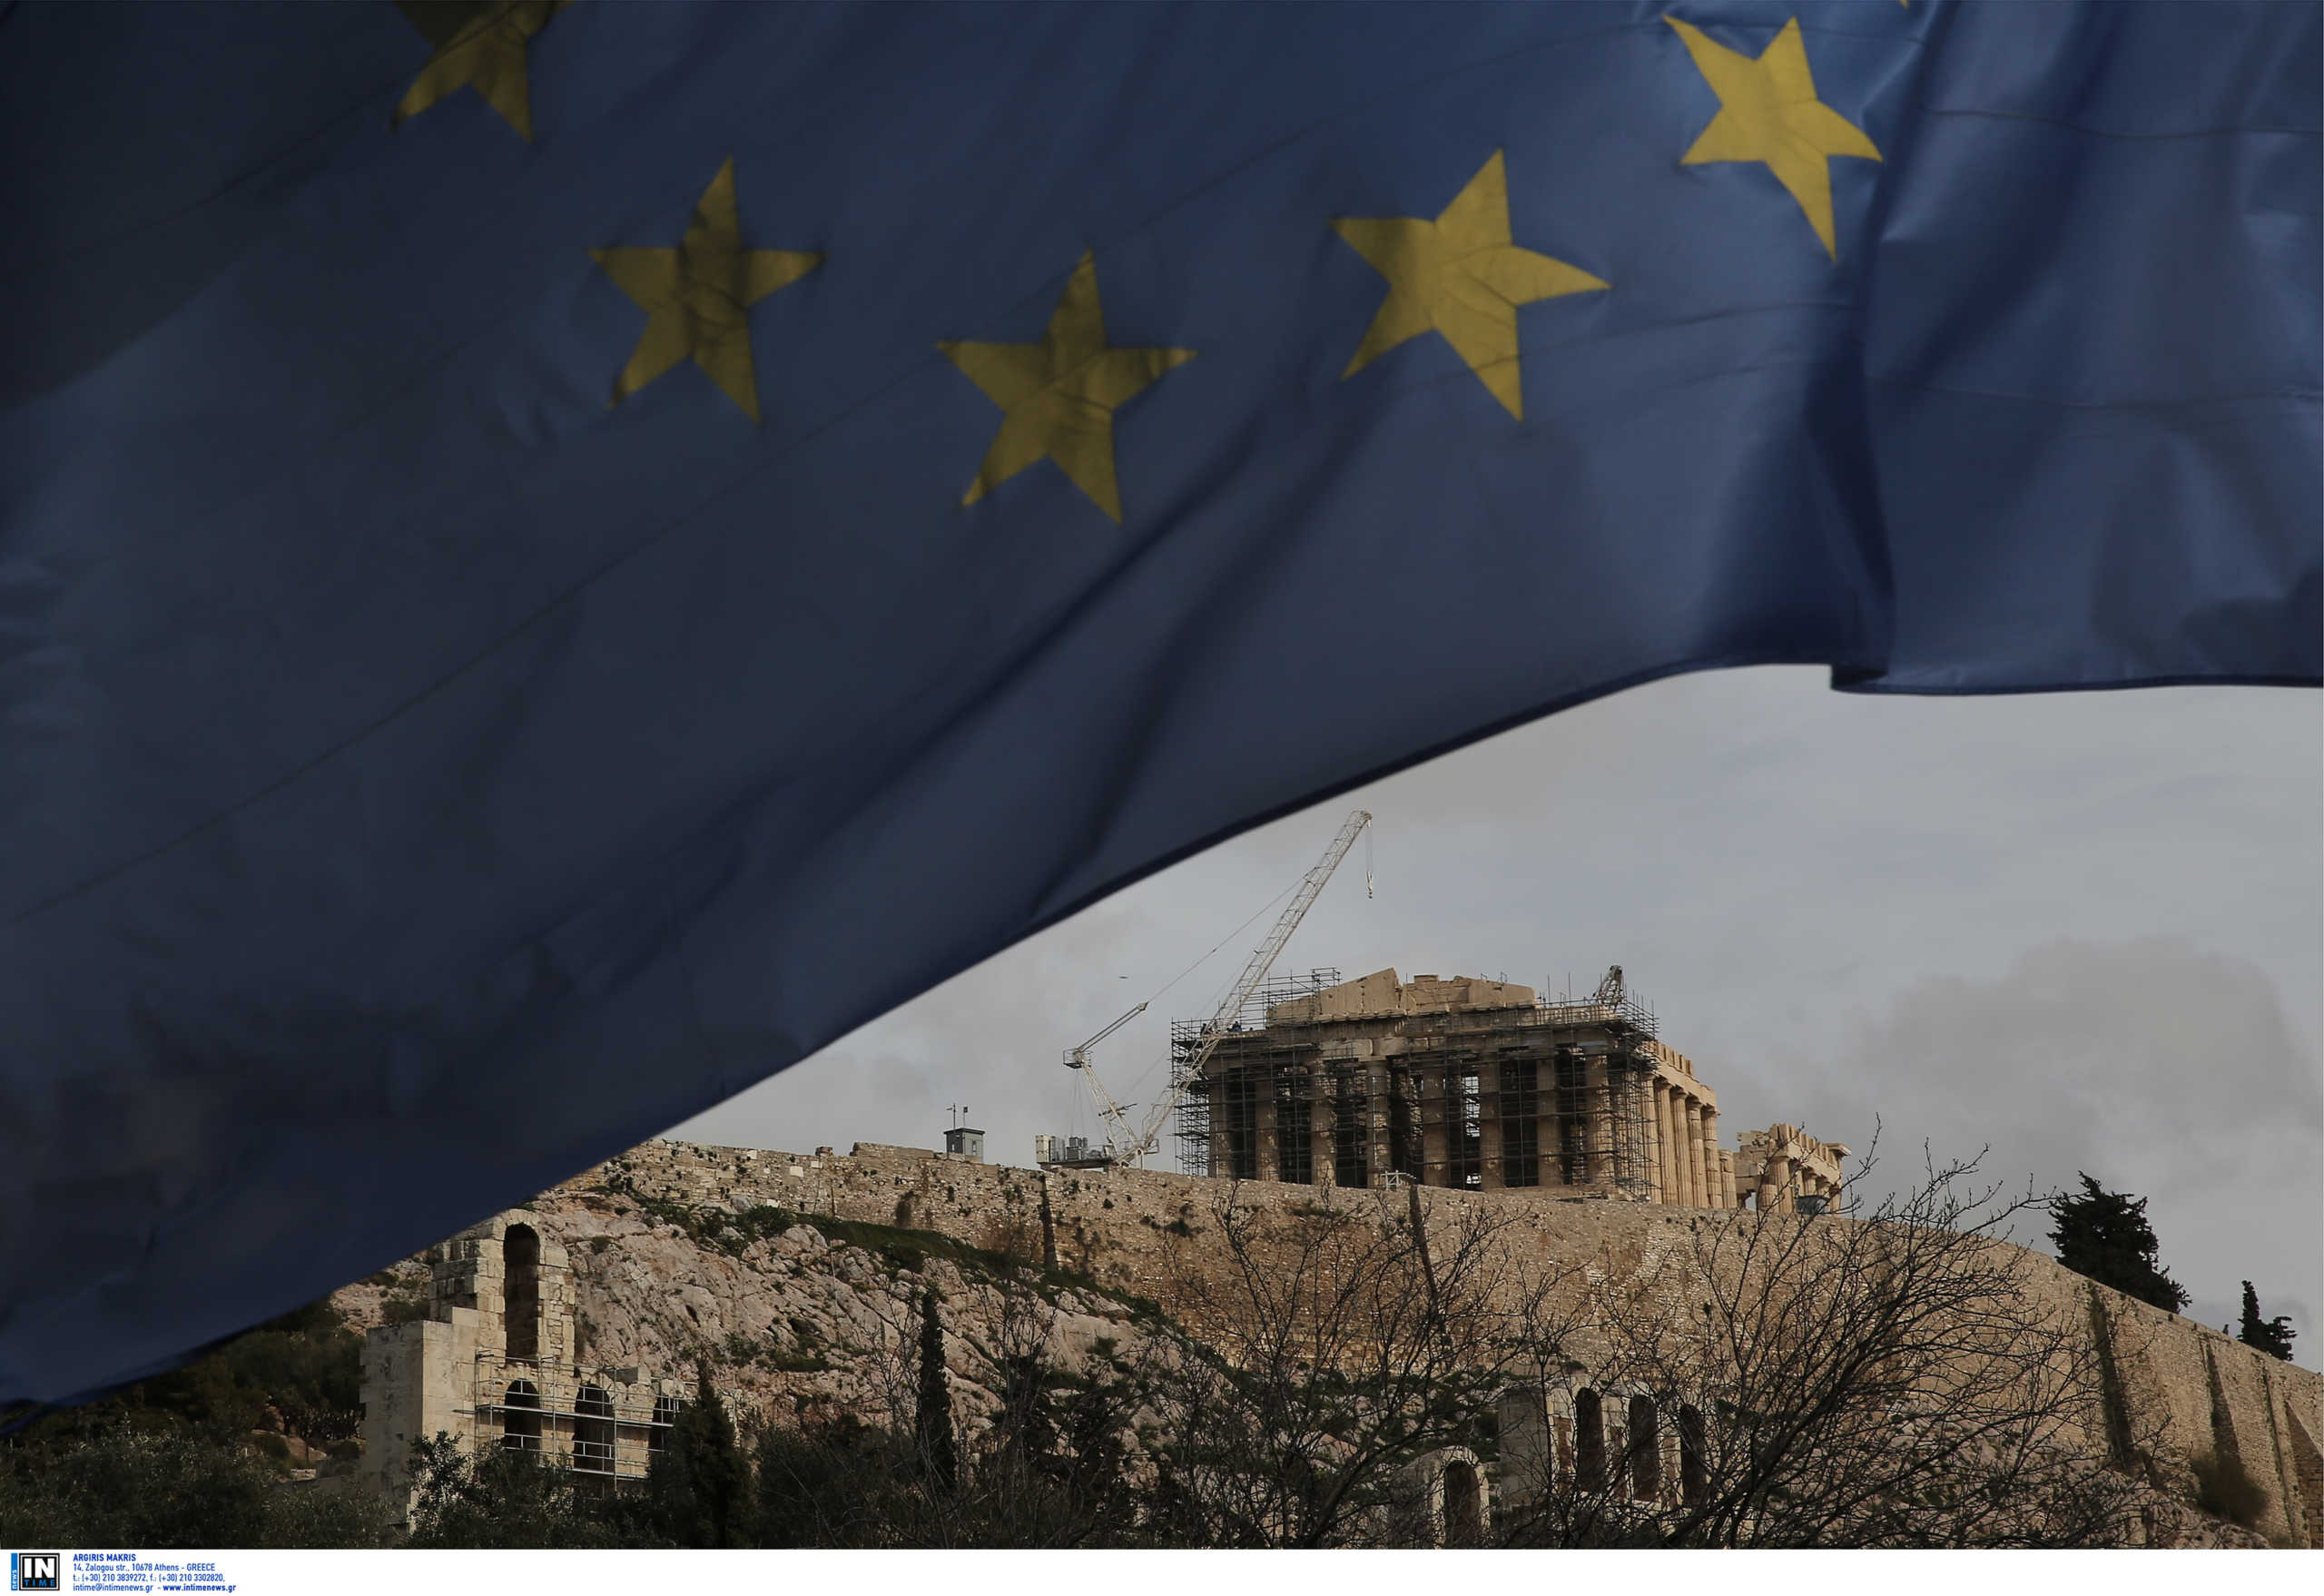 FAZ: «Ευτύχημα ότι η Ελλάδα ακολουθεί ενεργά το δικό της πρόγραμμα μεταρρυθμίσεων»